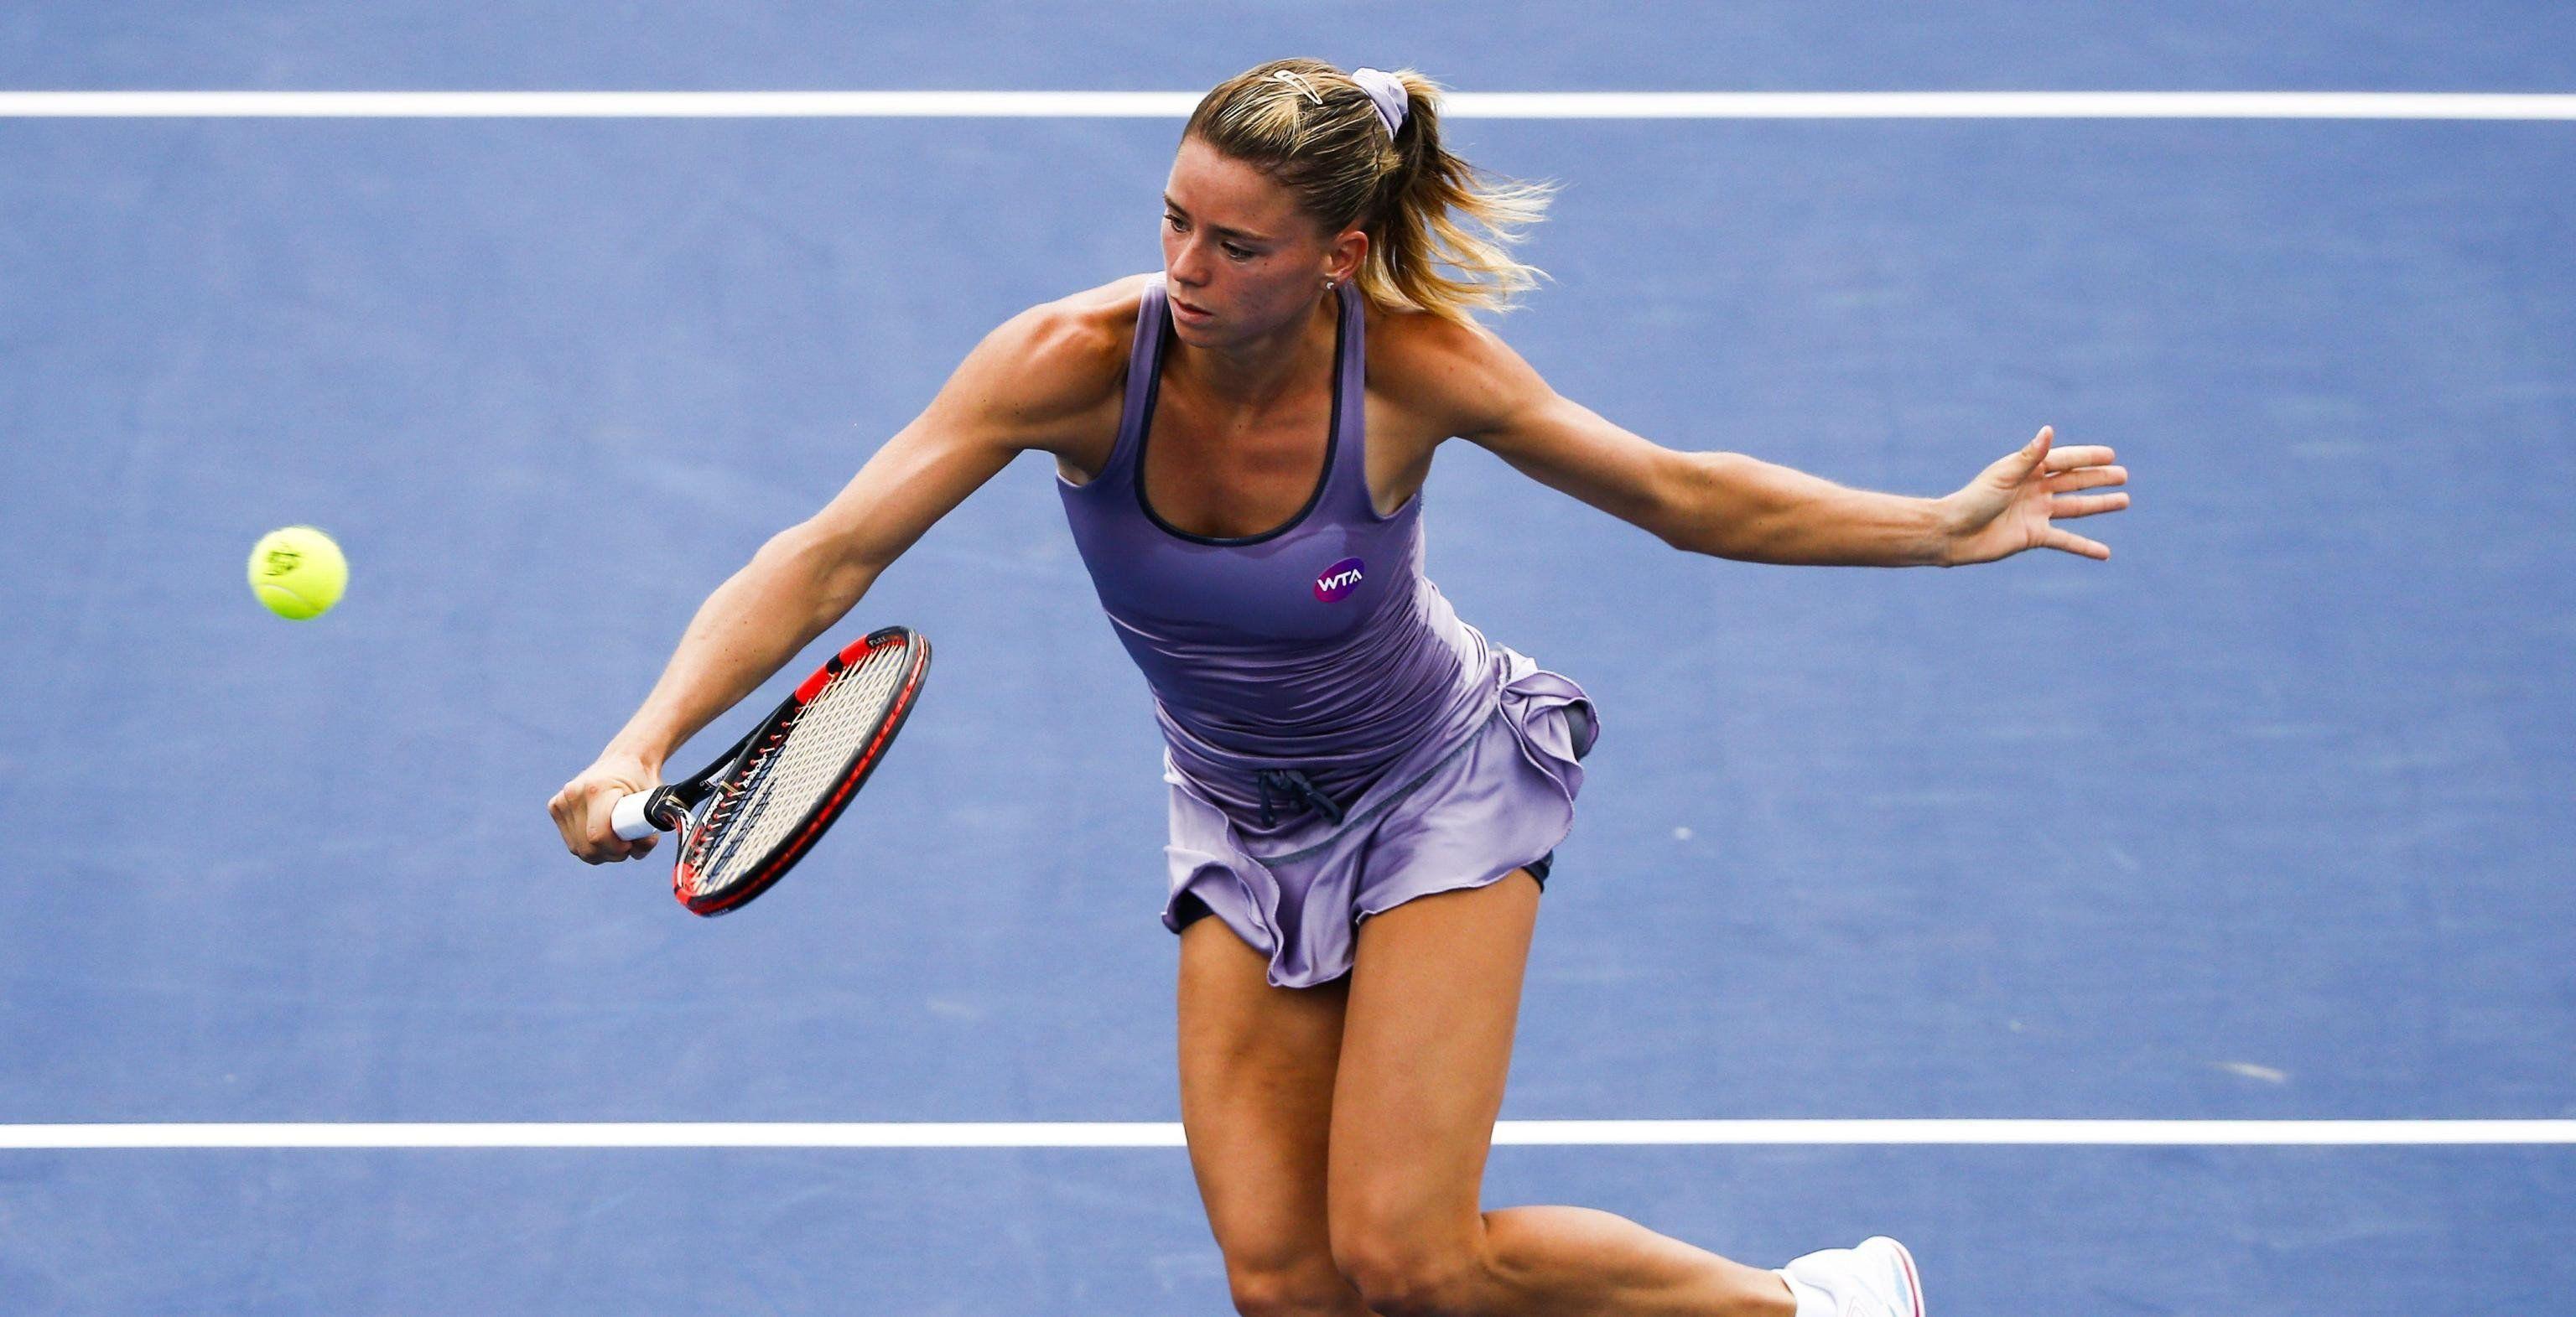 Camila Giorgi classe 1991, n.73 WTA